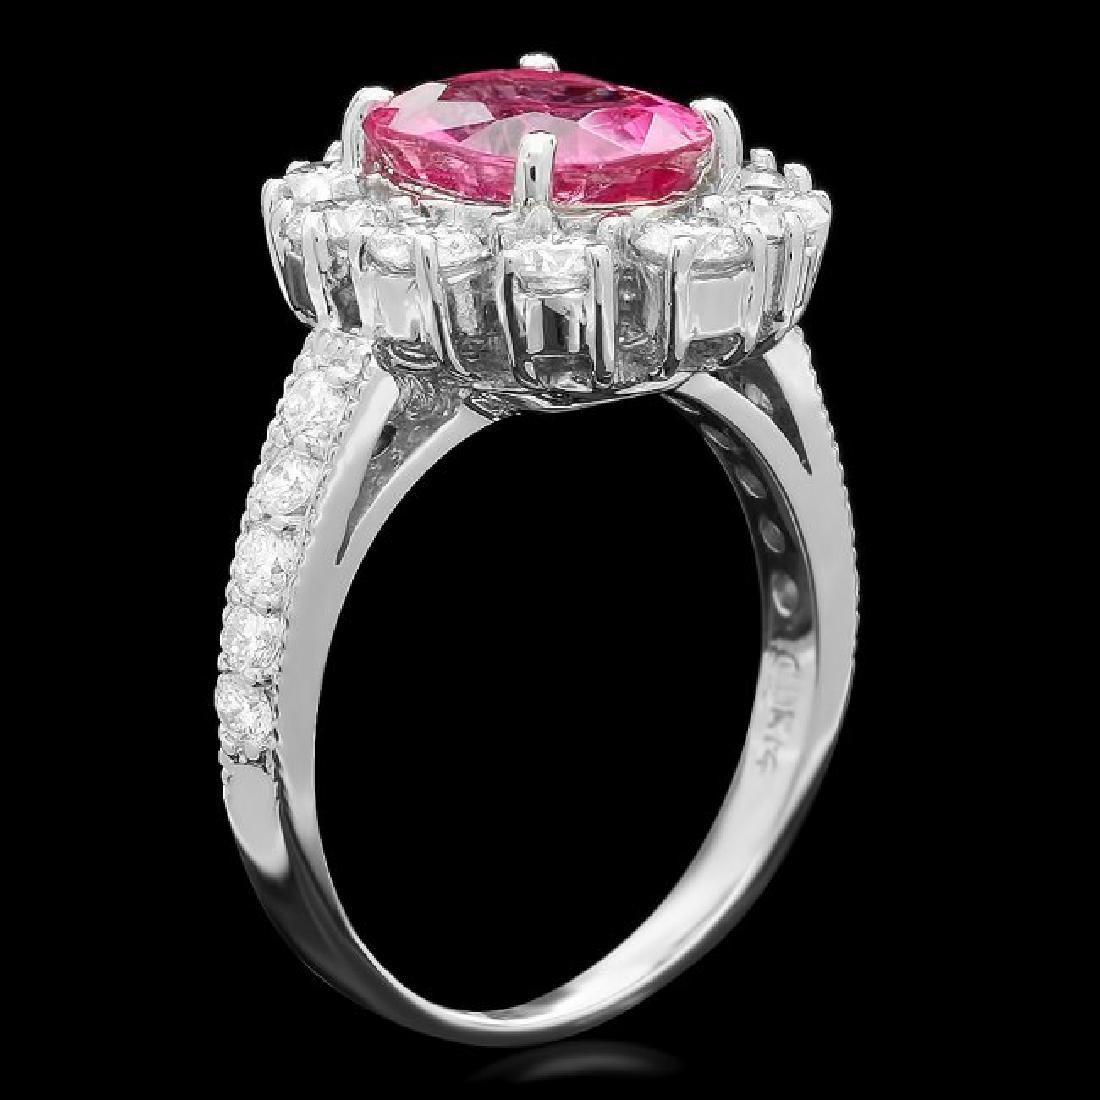 14k Gold 2.30ct Tourmaline 1.55ct Diamond Ring - 2